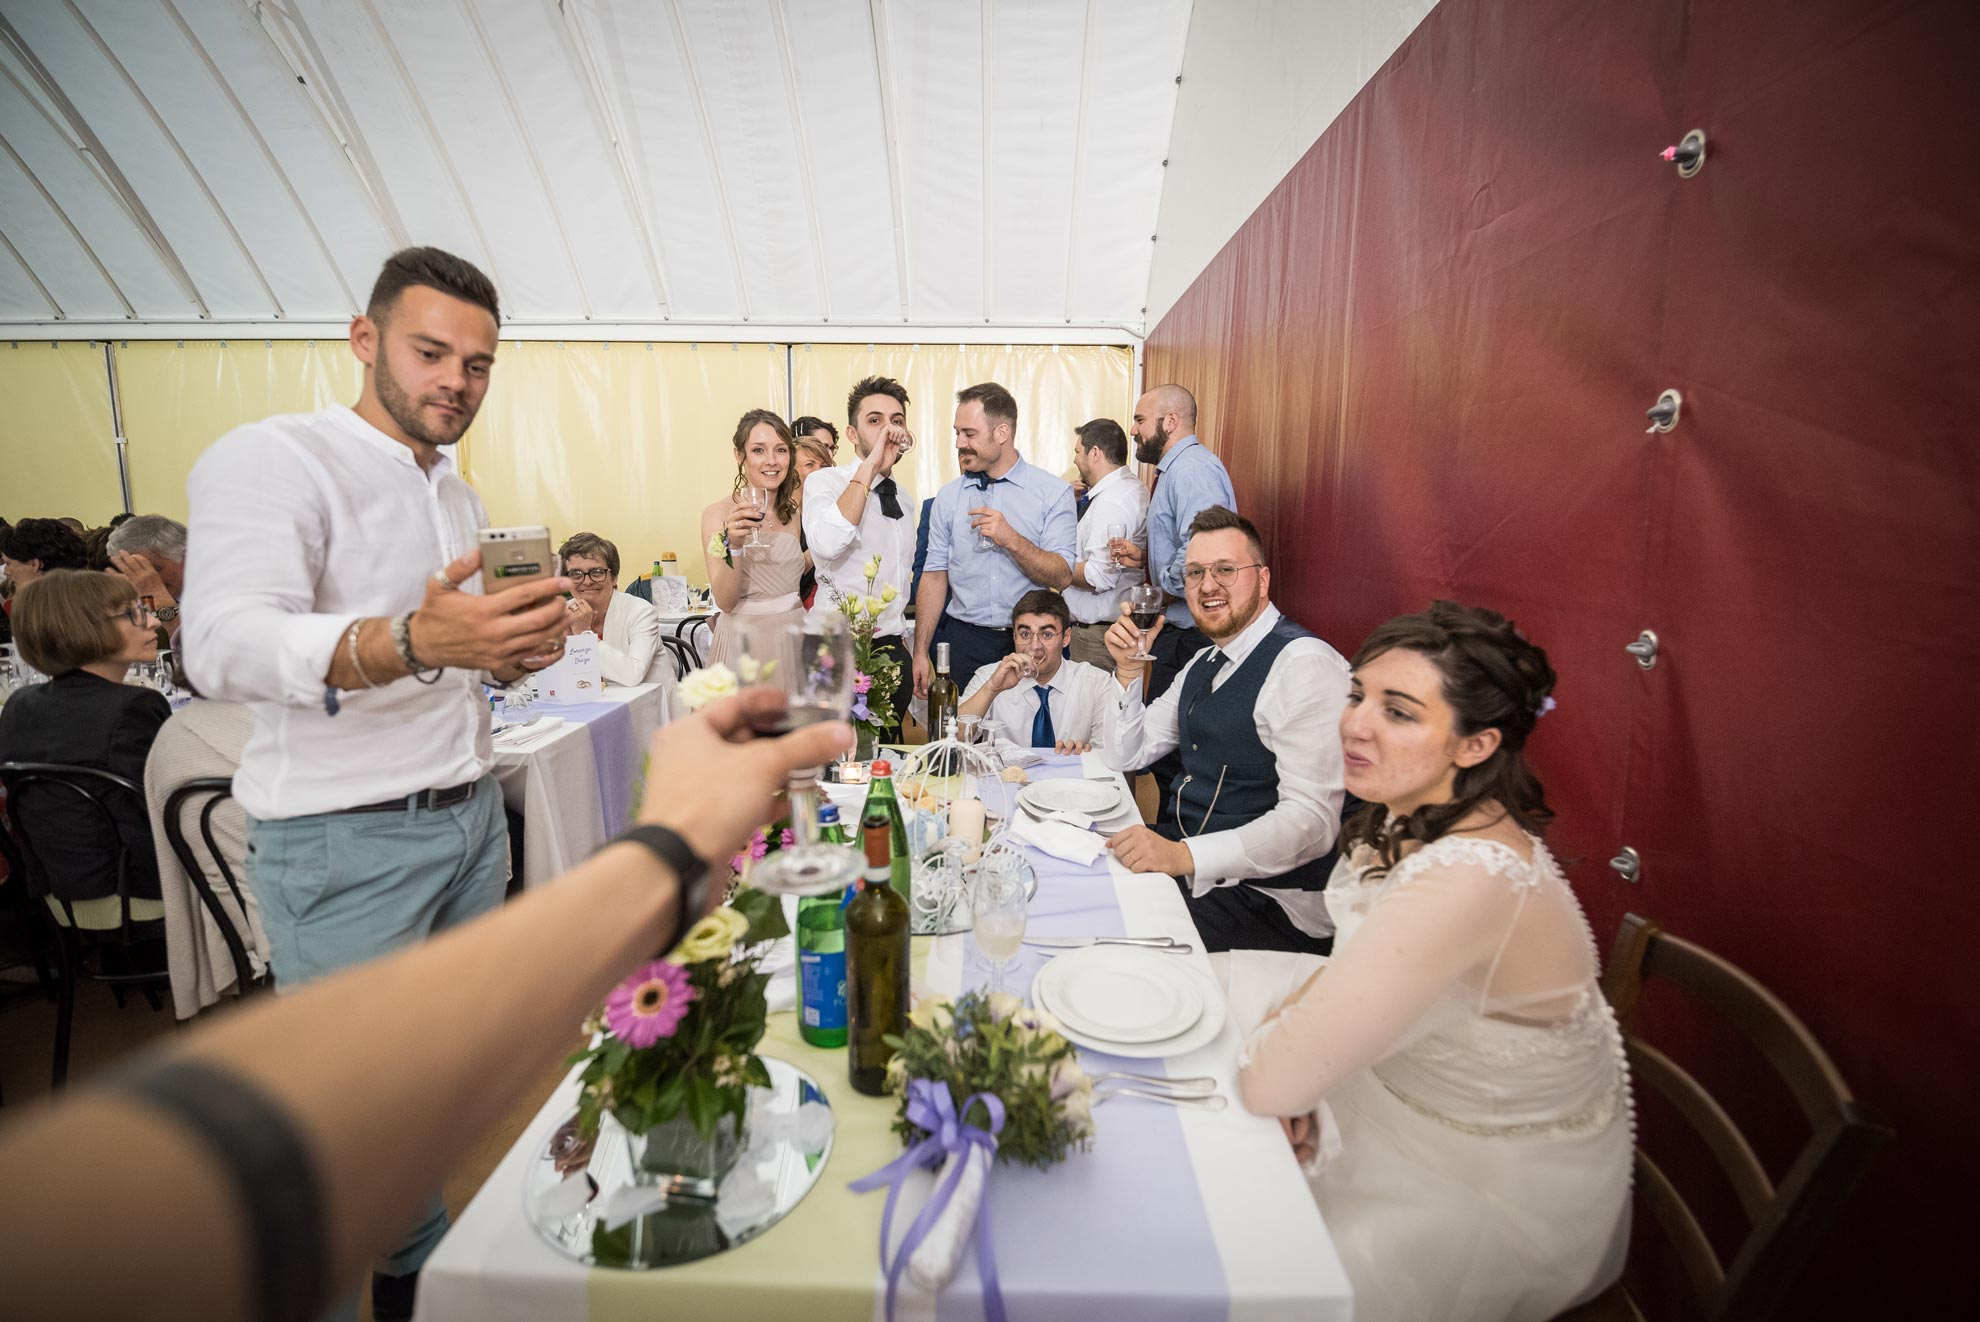 Matrimonio a Narzole Lorenza Diego - DSC 0811 - Fotografie artistiche matrimonio nel Roero - Fotografie artistiche matrimonio nel Roero